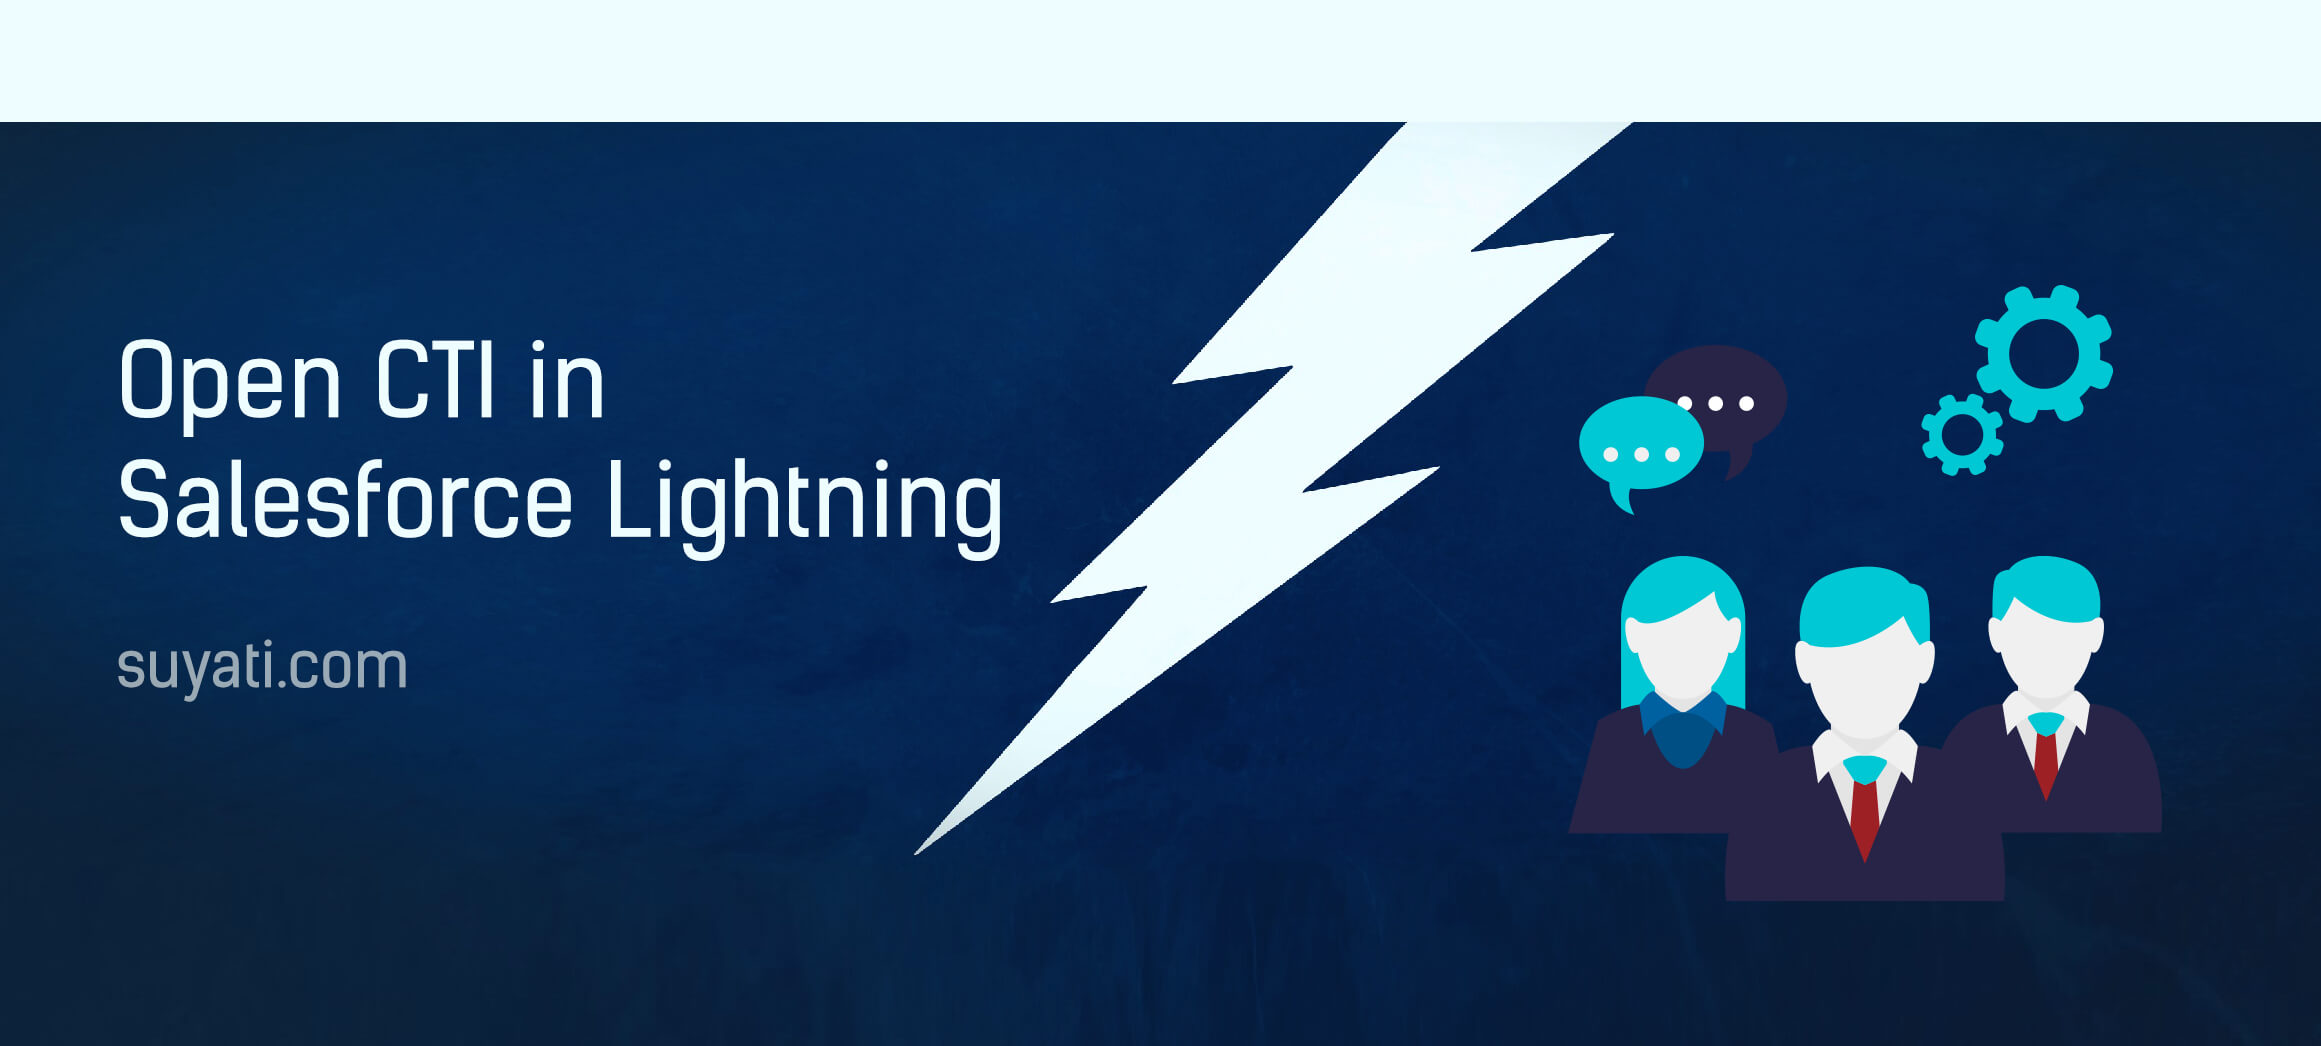 Introducing Open CTI in Salesforce Lightning